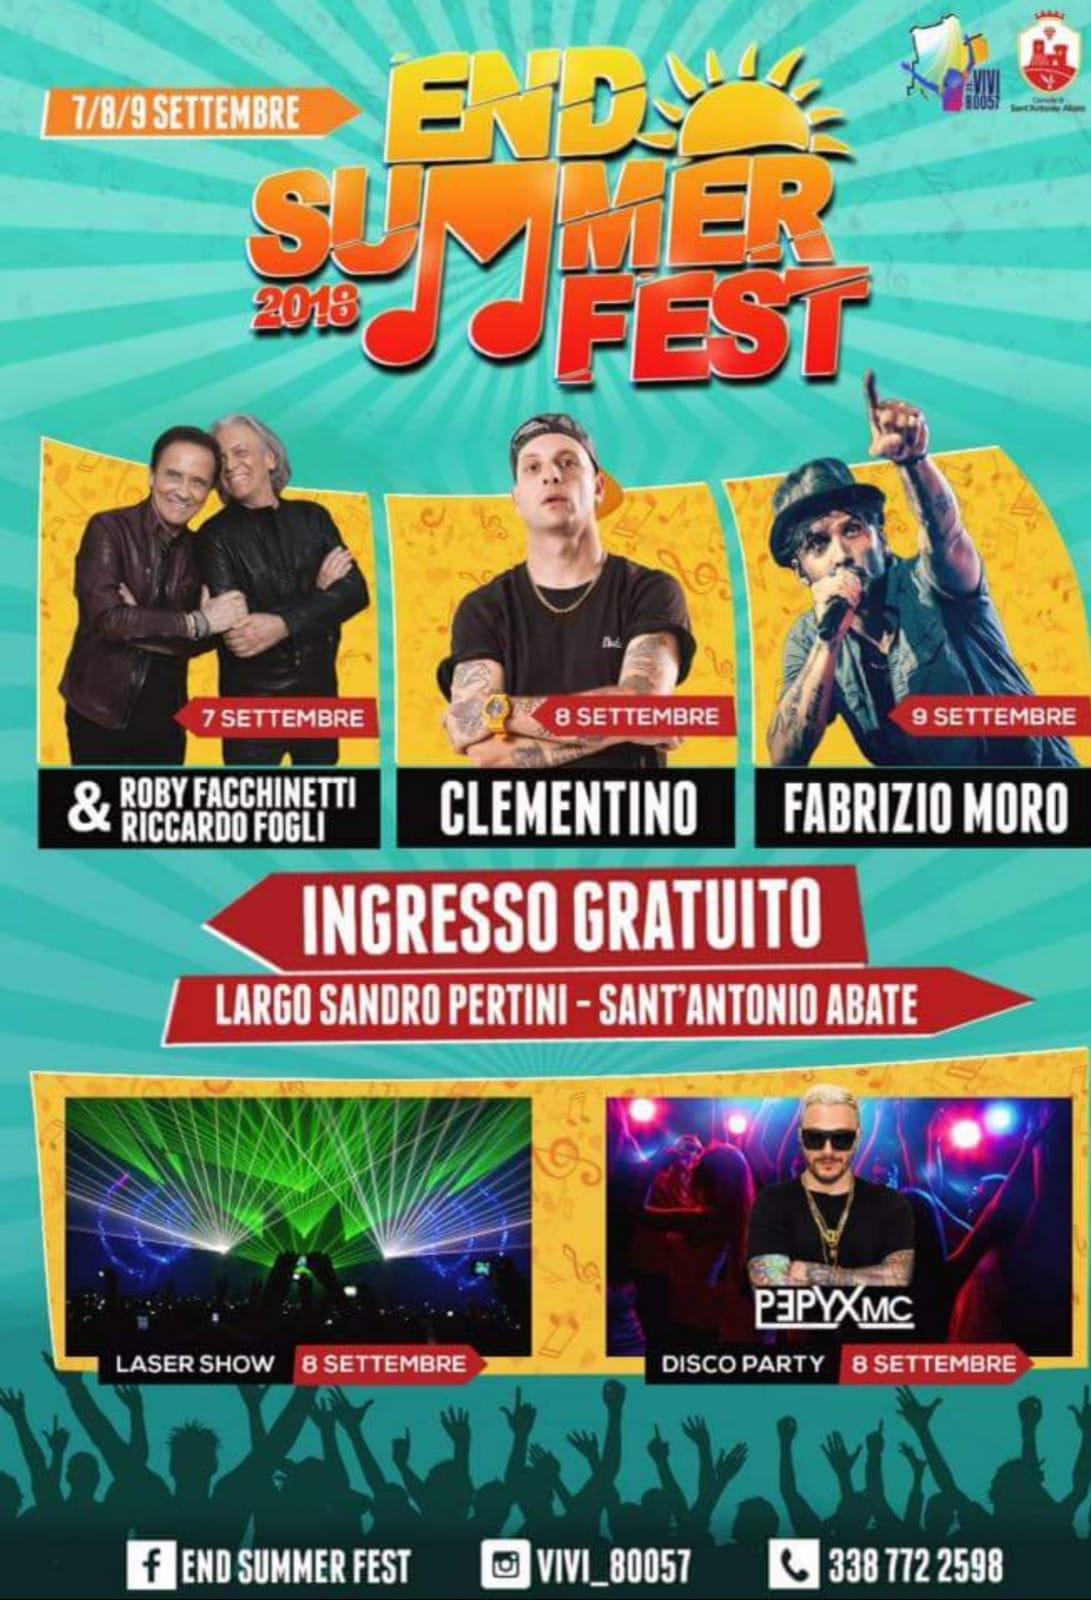 End Summer Fest 2018